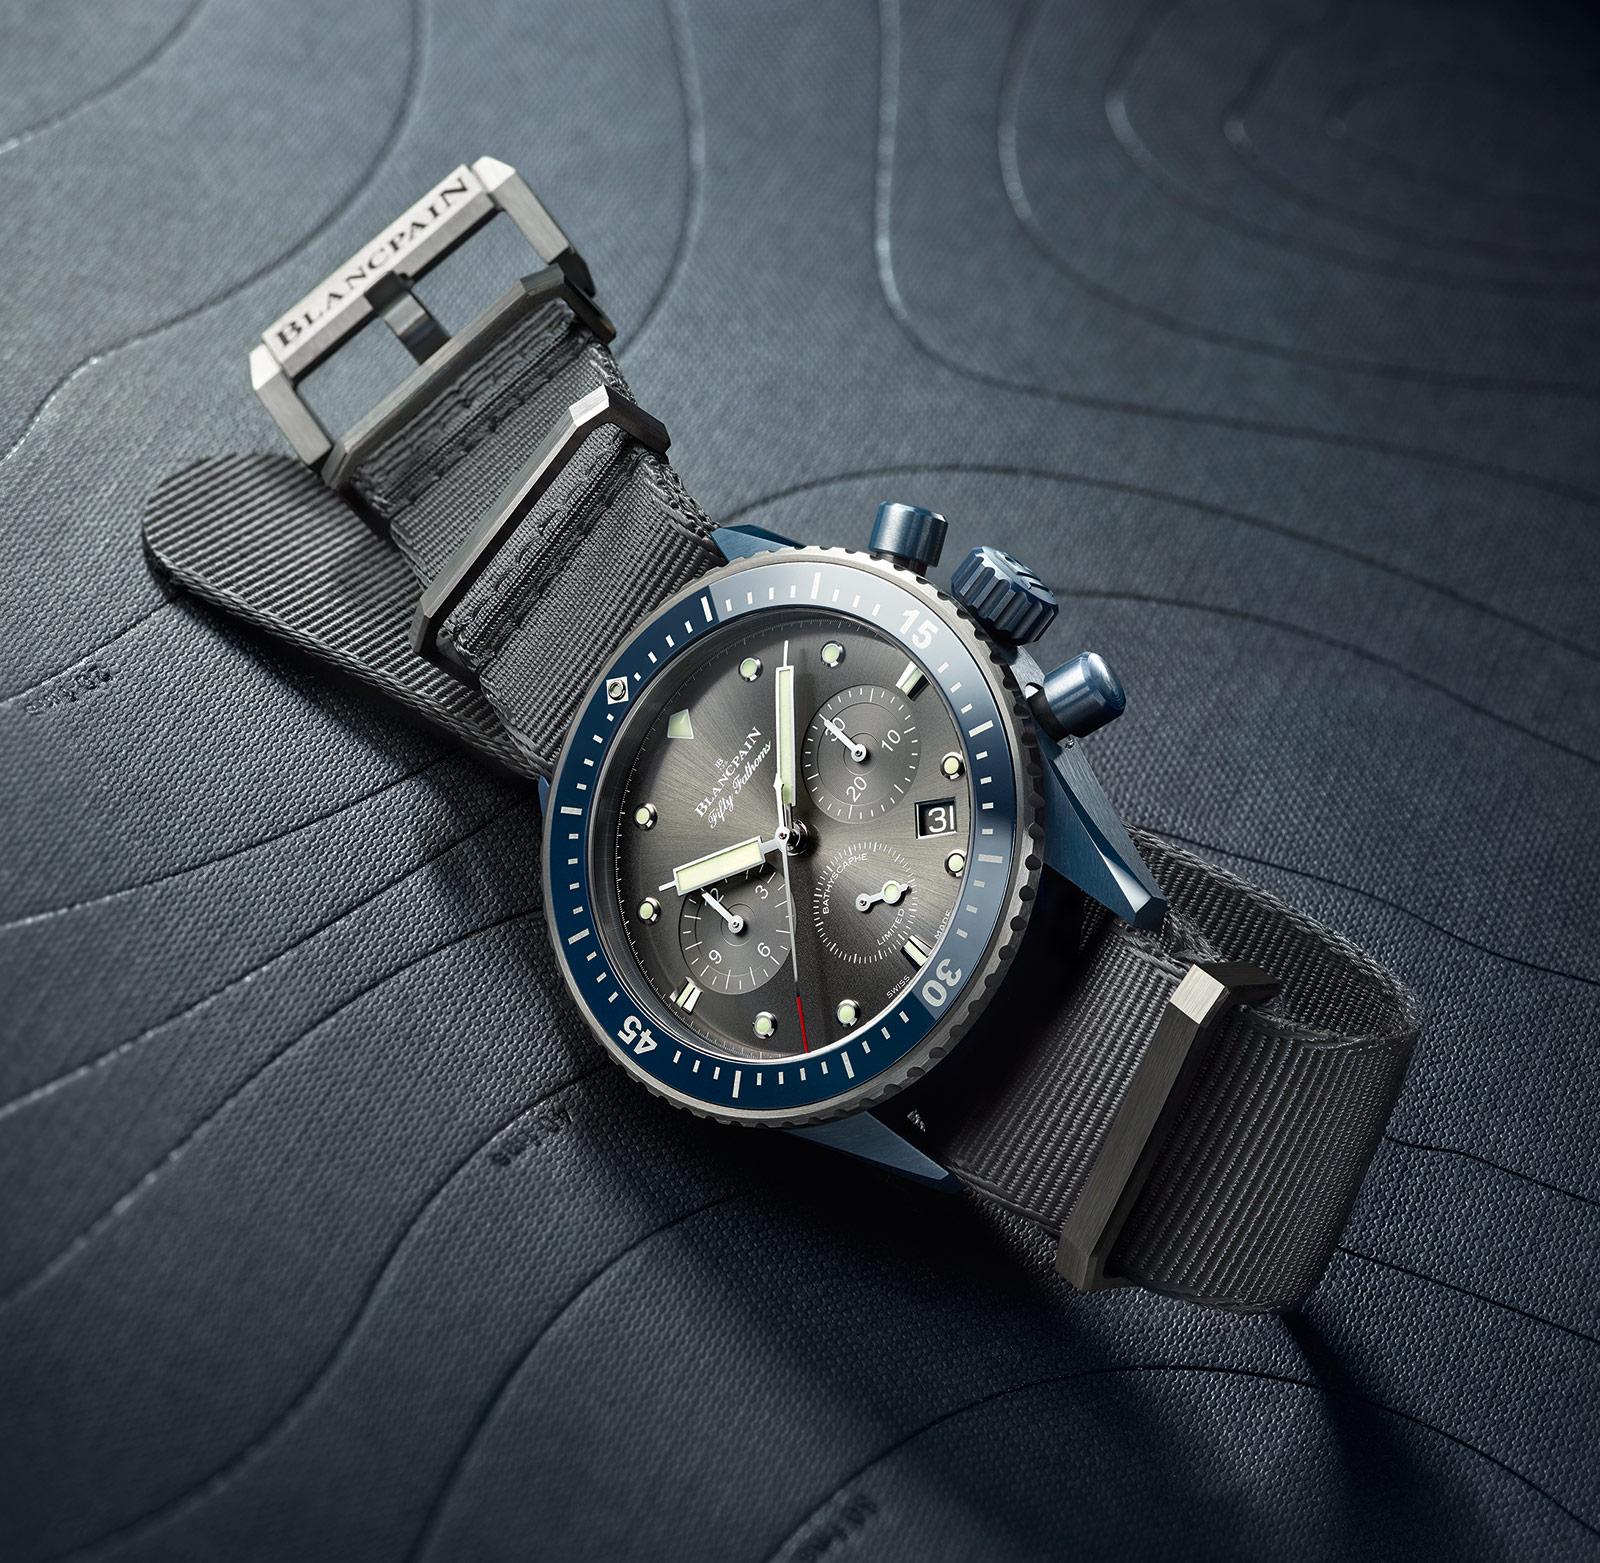 Blancpain Bathyscaphe Flyback Chronograph BOC II 3